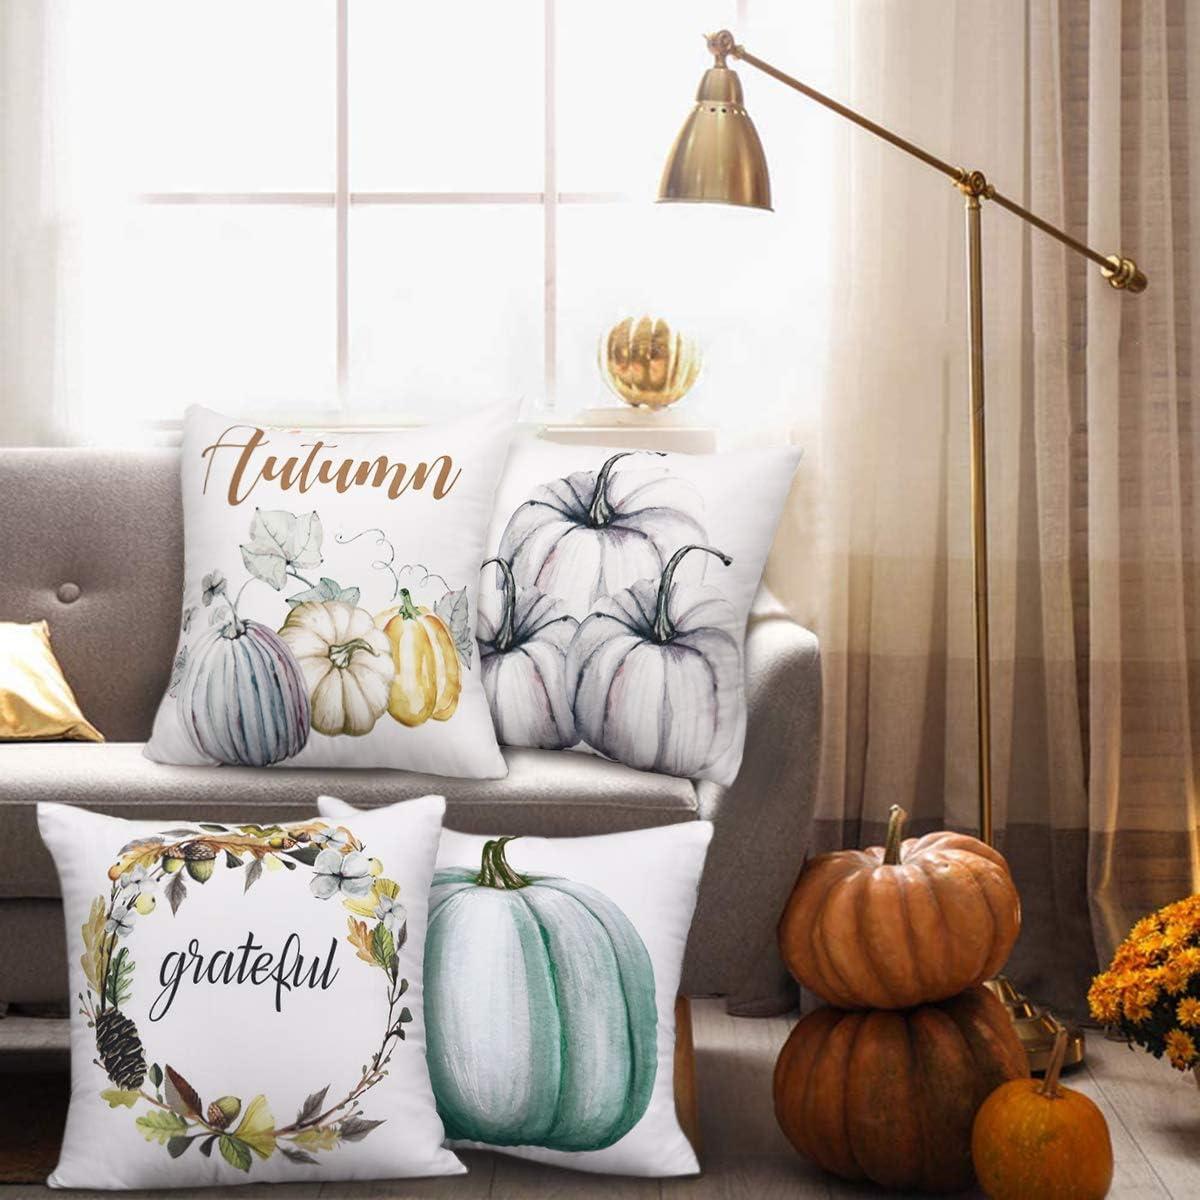 Waist Pumpkin Home Decor Halloween Pillow Case Cover New Sofa Cushion Throw Z2S0